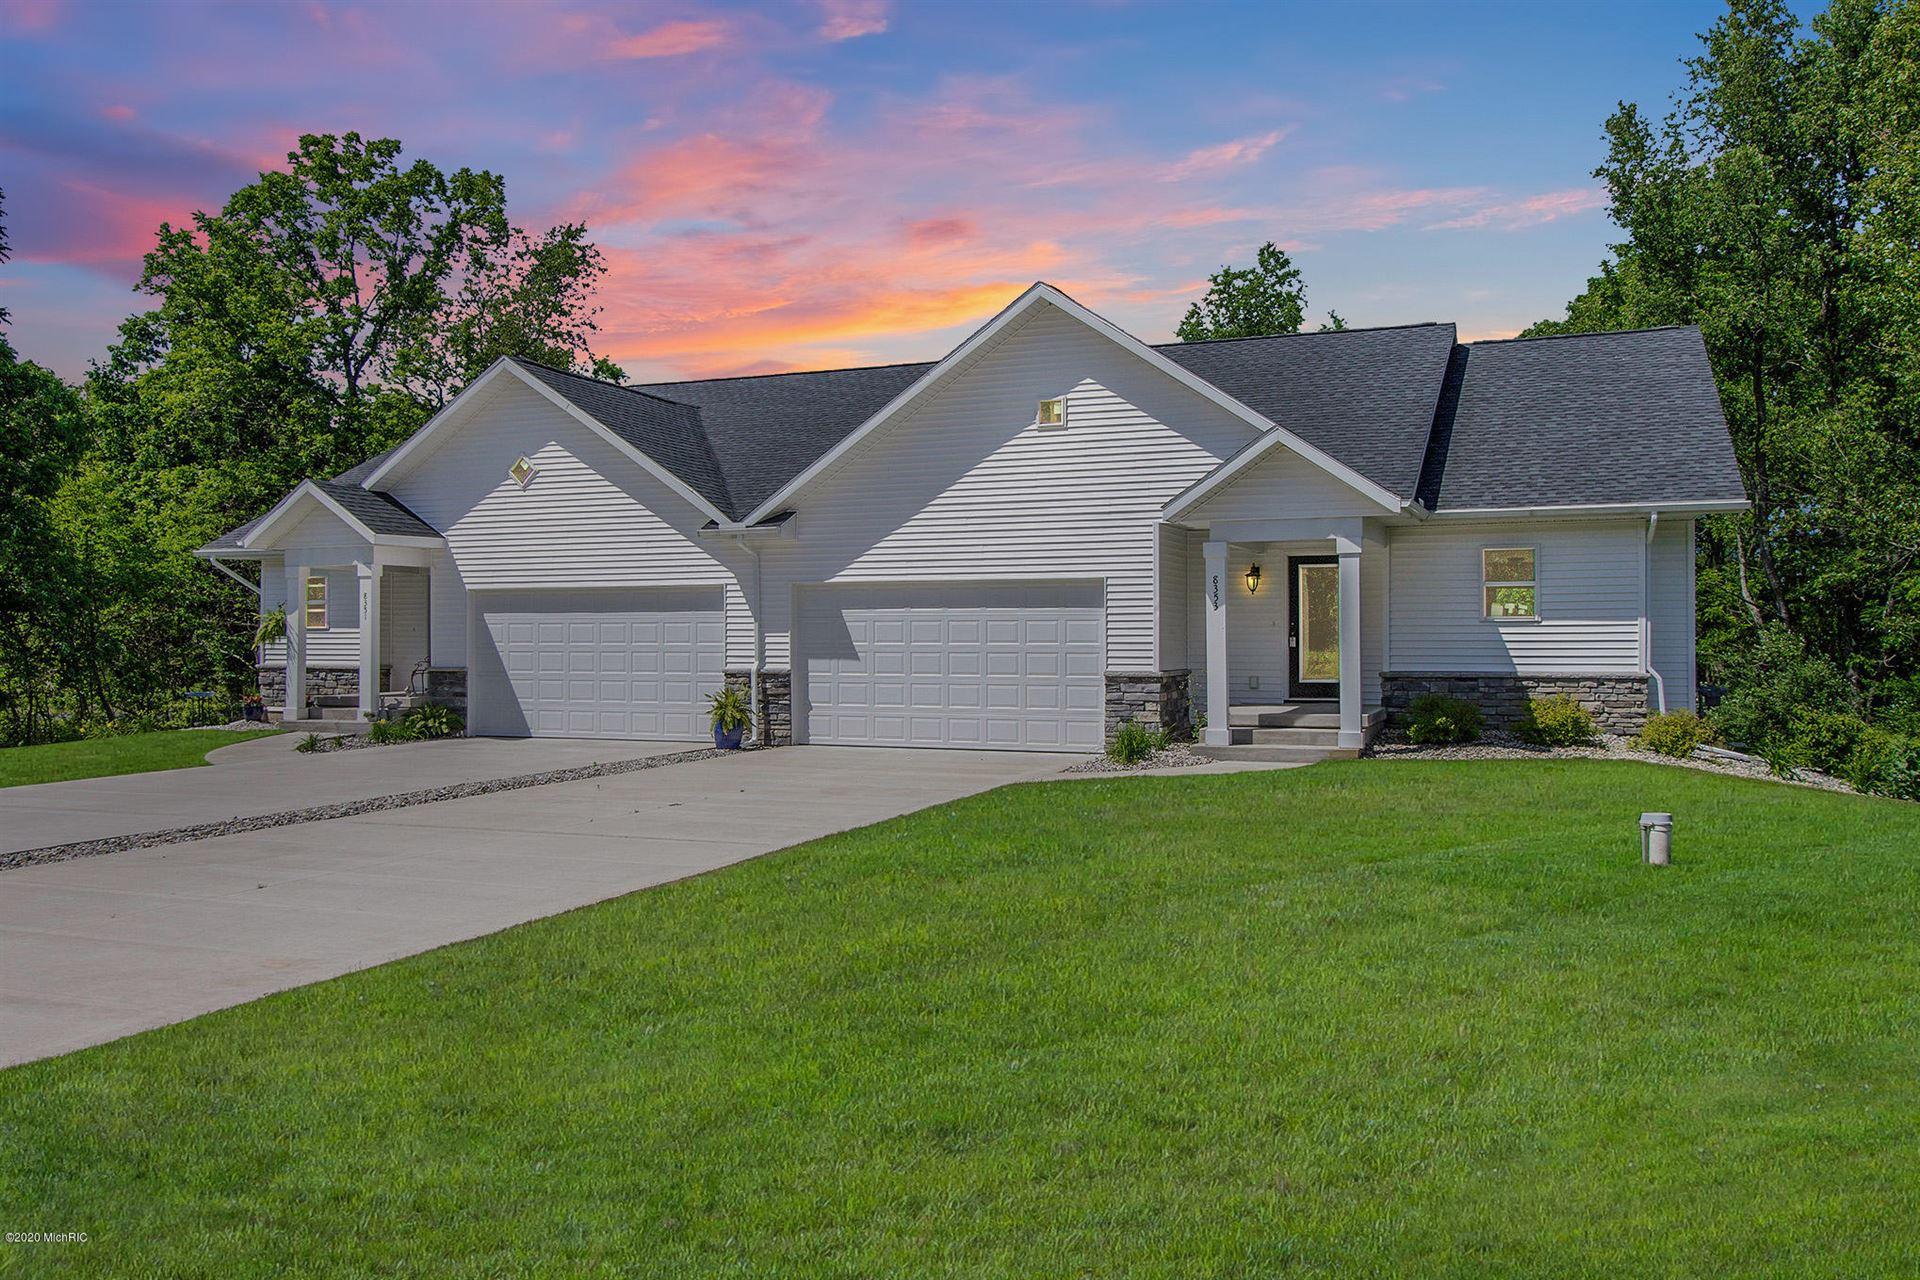 8353 Millstone Court #2, Kalamazoo, MI 49009 - MLS#: 20021412